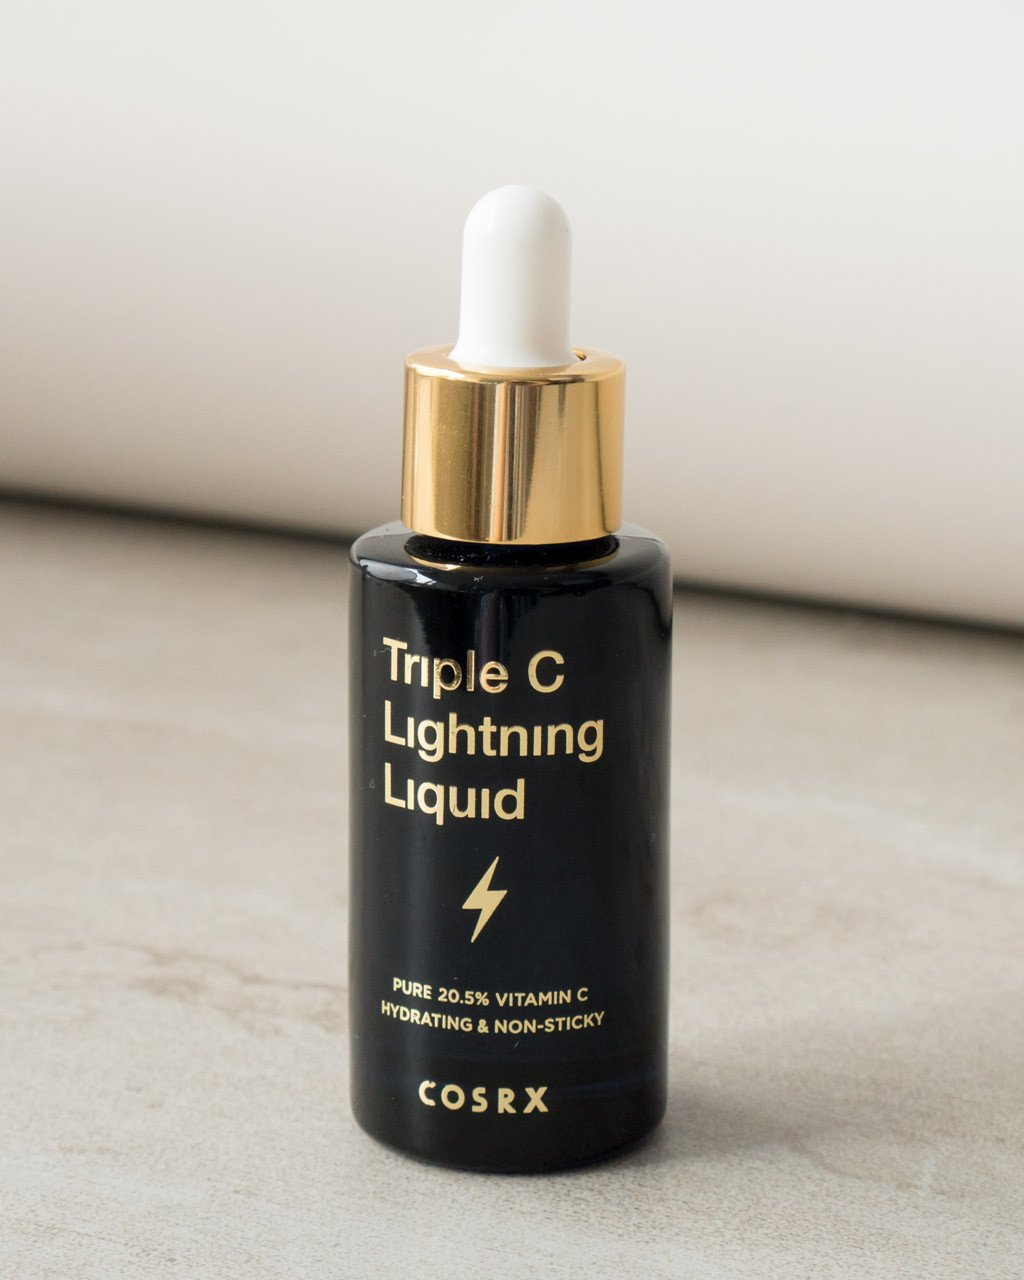 COSRX-Triple-C-Lightning-Liquid-2.jpg